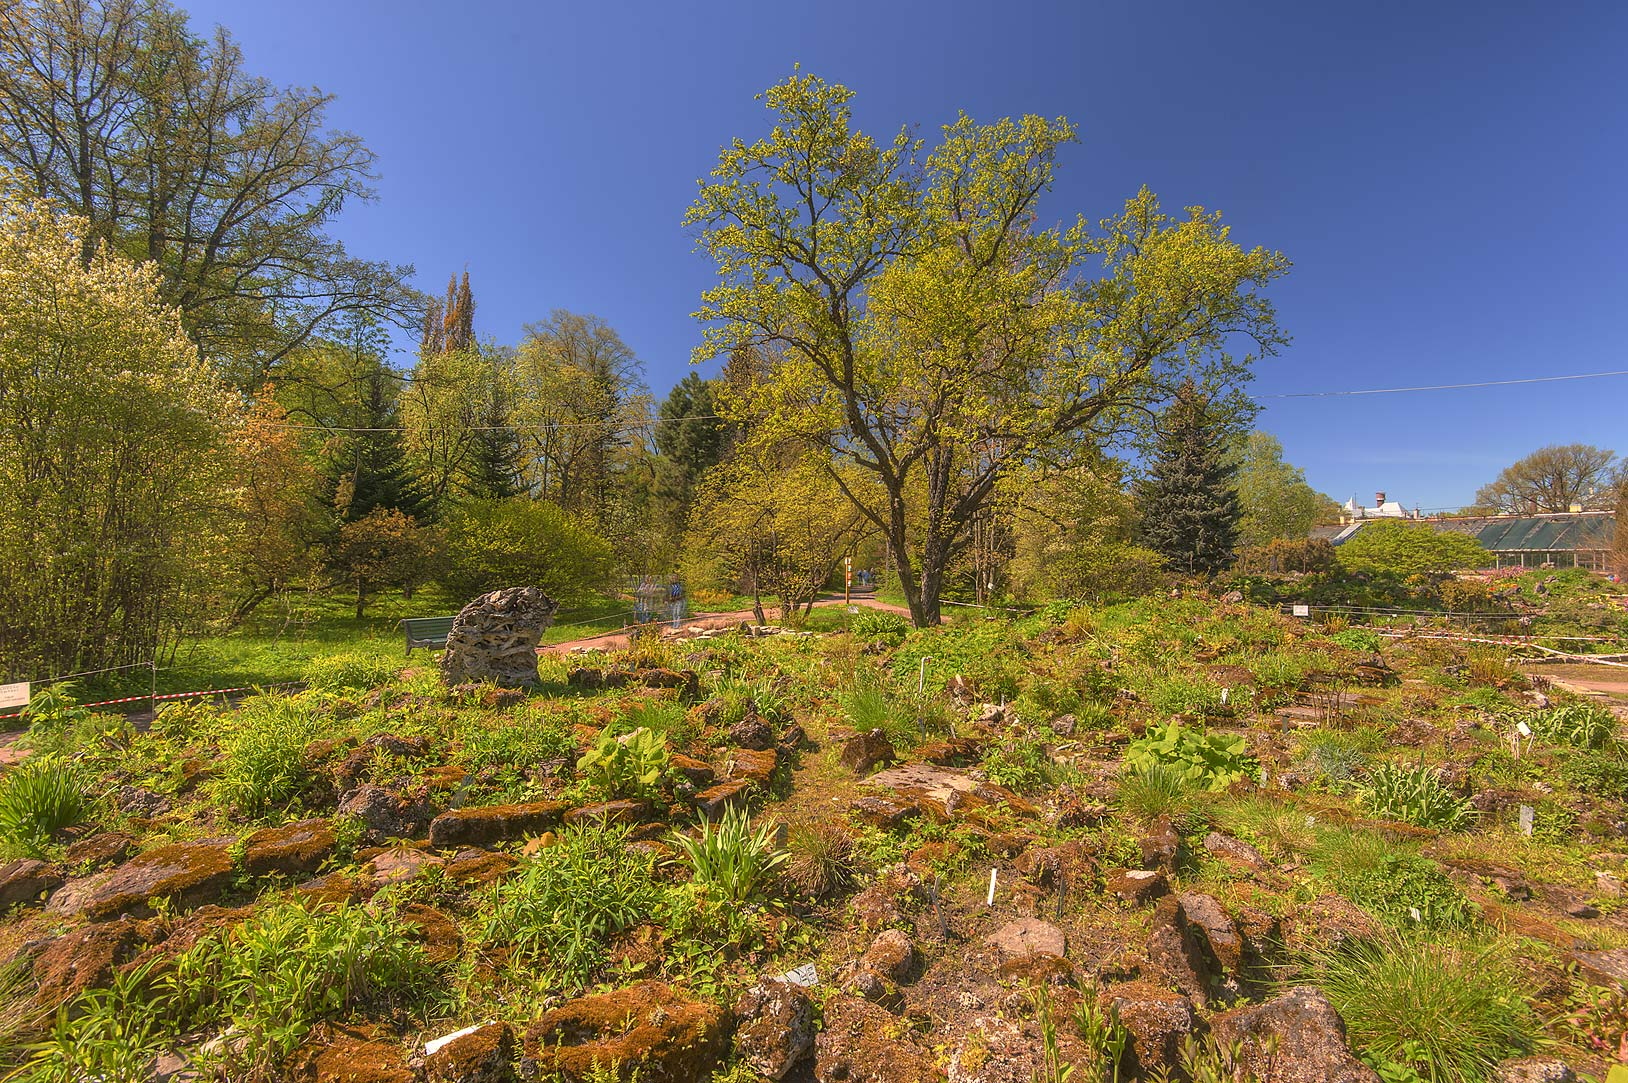 Photo 1596 12 Alpine Hill In Botanic Gardens Of Komarov Botanical Institute St Petersburg Russia